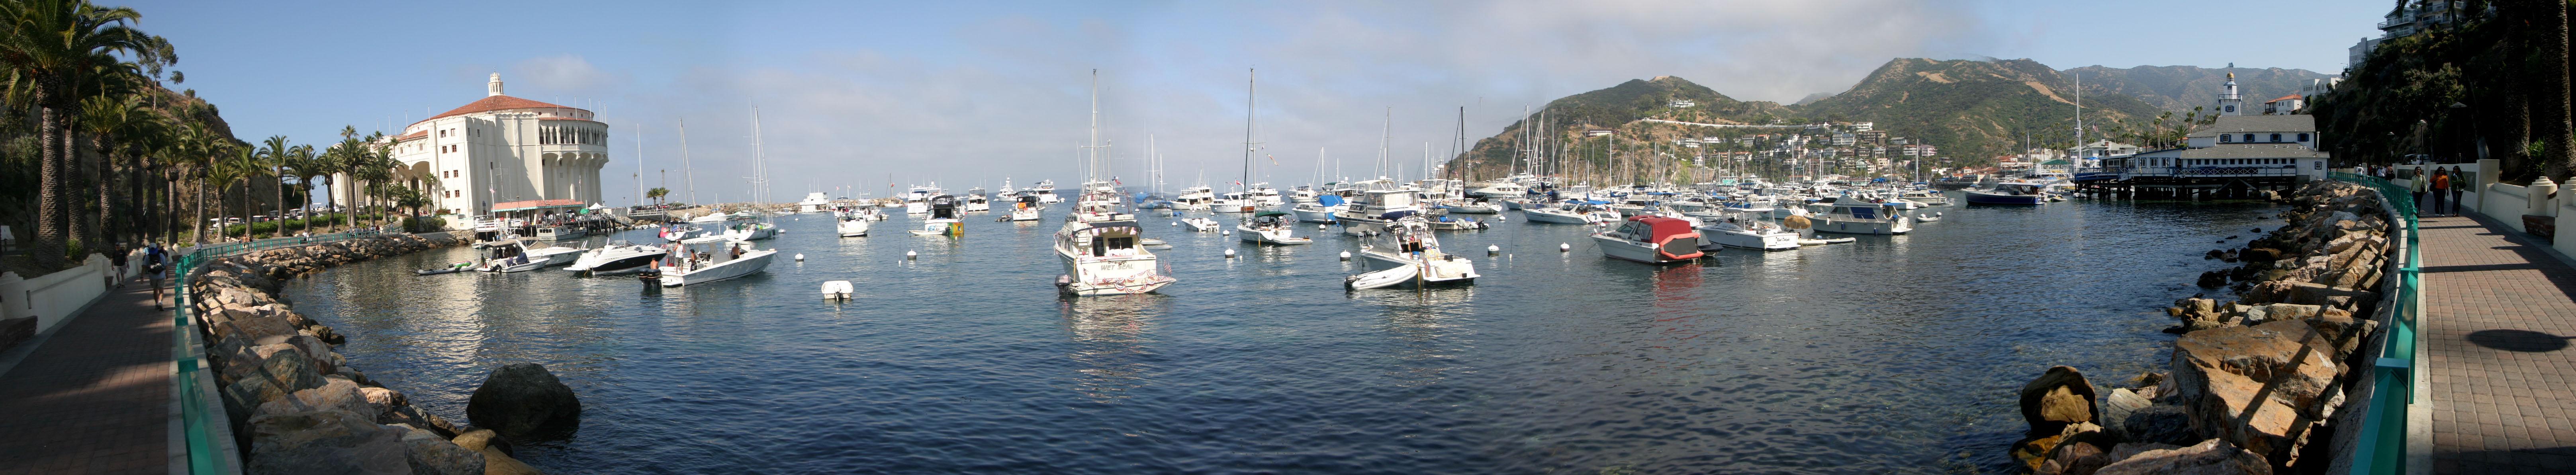 CatalinaPan2005.jpg